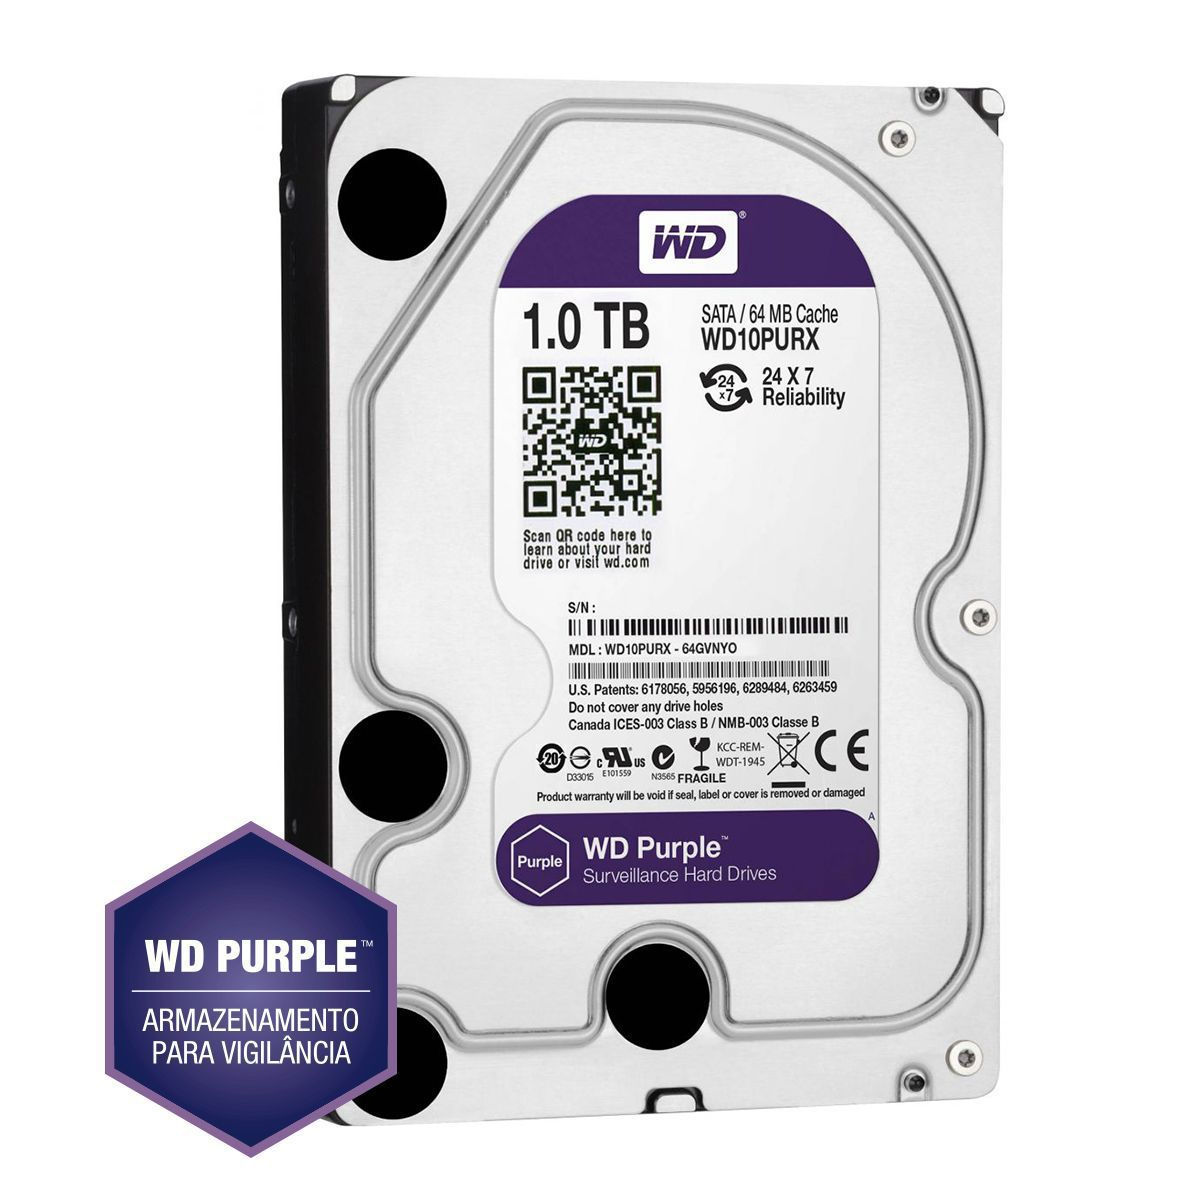 Dvr Stand Alone 4 Canais 3104 Full Hd + HD Purple 1TB 1080p Intelbras Multi